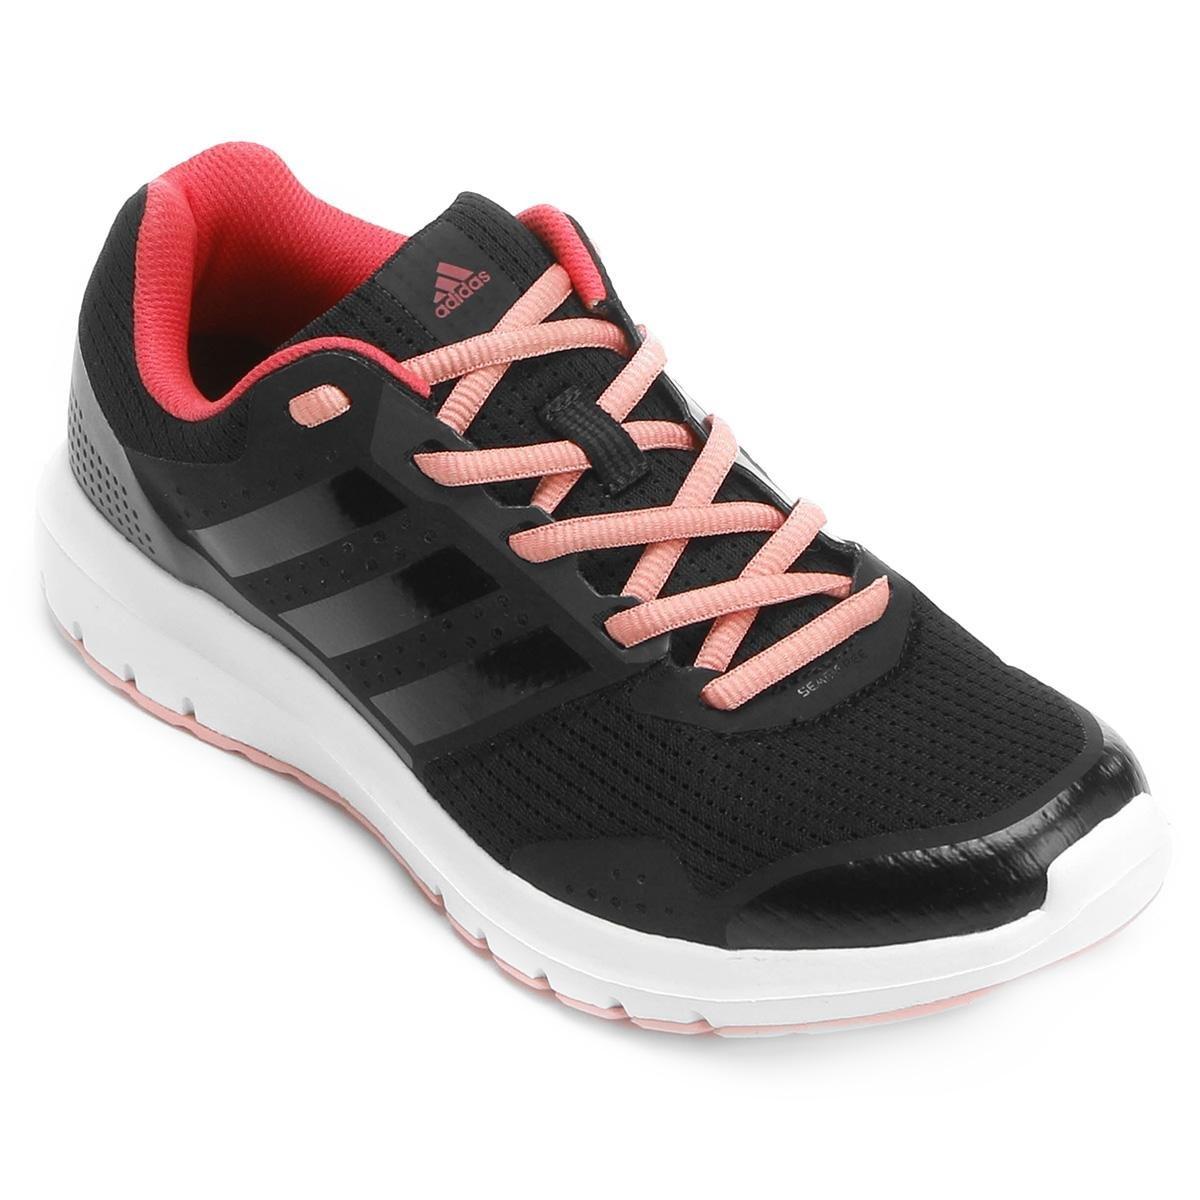 Feminino Feminino Duramo Preto Tênis Adidas e 7 Duramo Adidas 7 Preto Rosa Tênis qgAHpIn1w